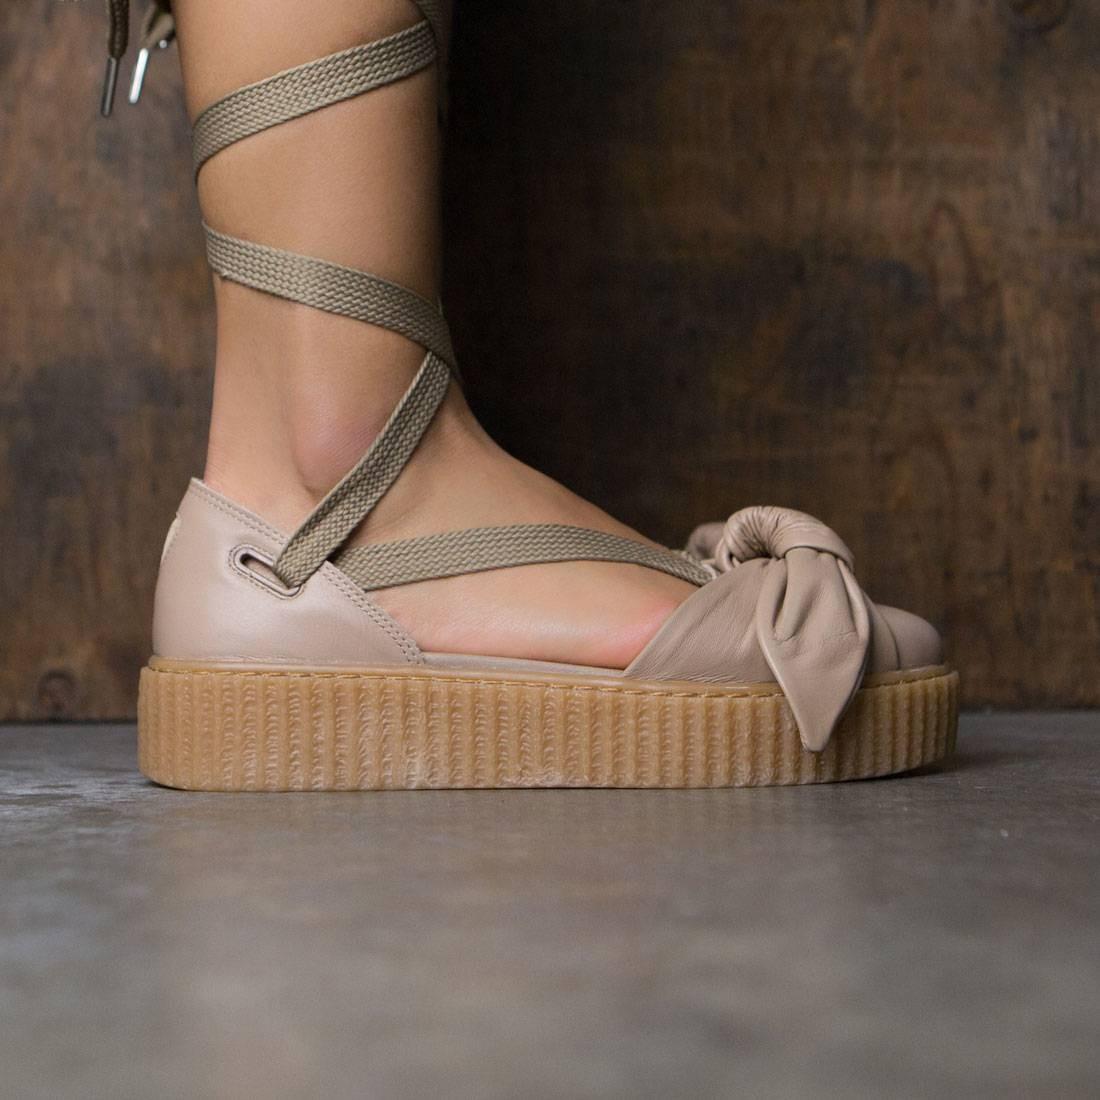 f2828494af71 Puma x Fenty By Rihanna Women Bow Creeper Sandal natural oatmeal